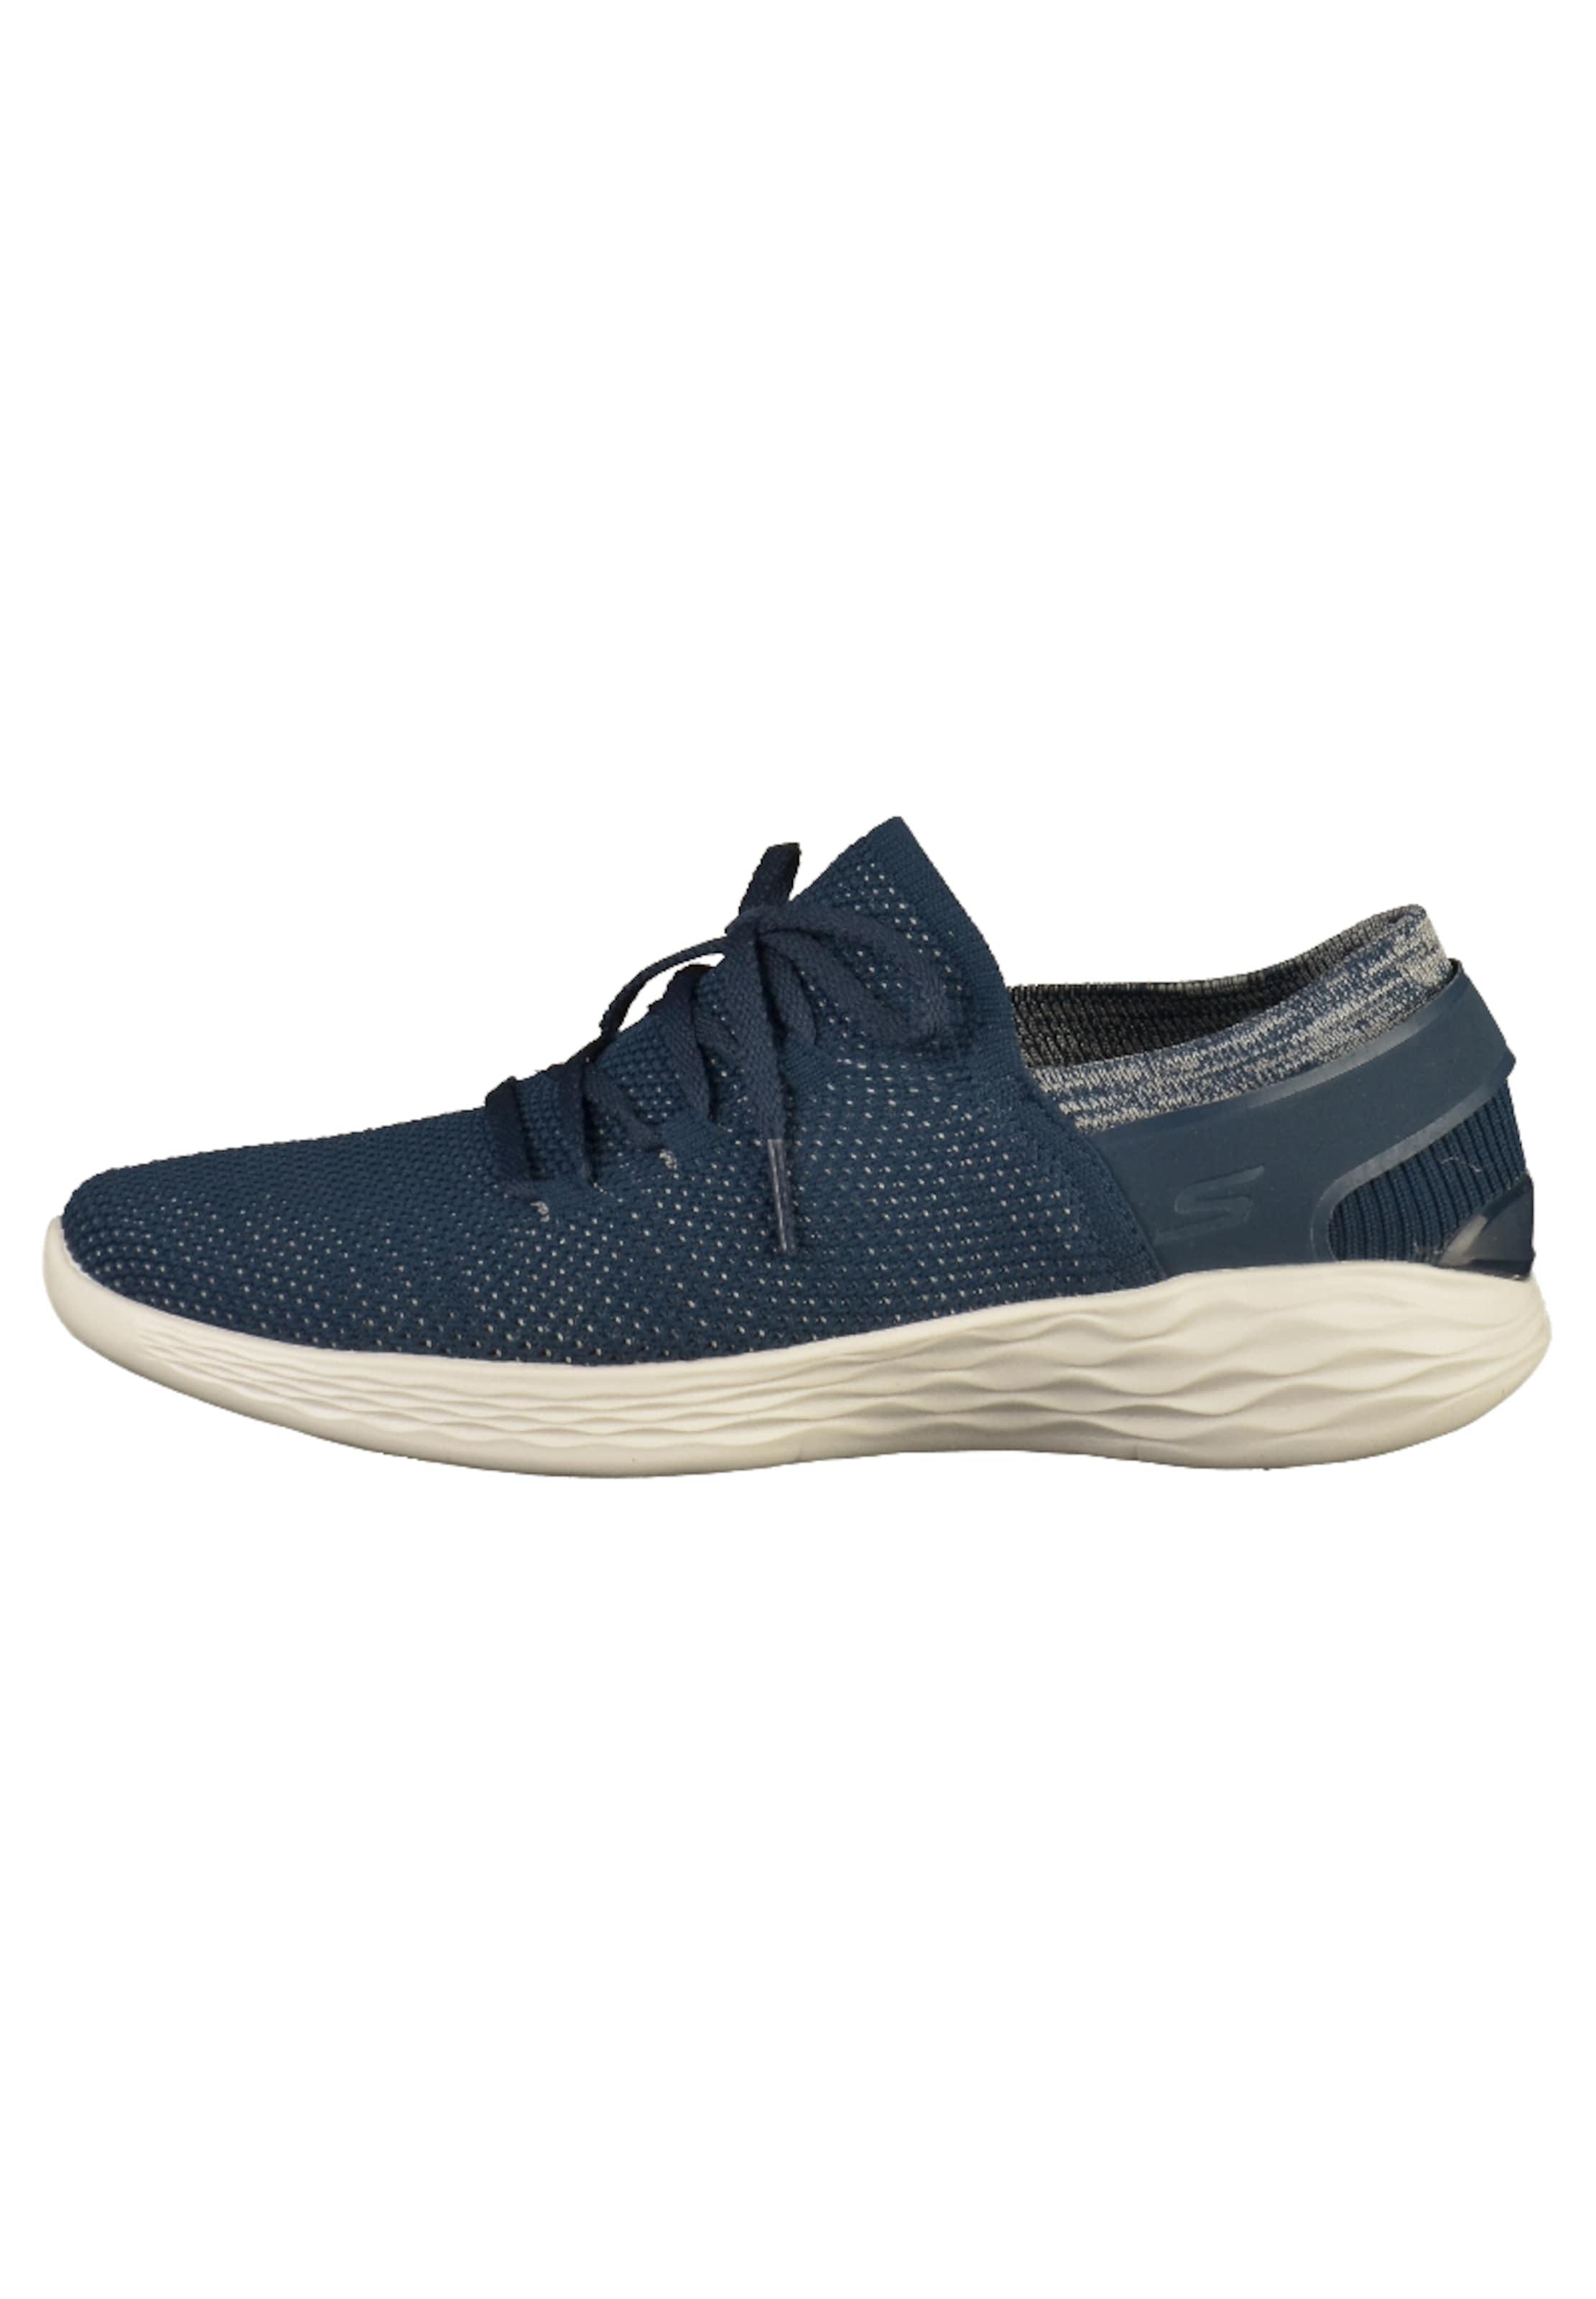 Sneaker In NavyGraumeliert Sneaker Skechers Skechers Skechers In NavyGraumeliert EID9WH2